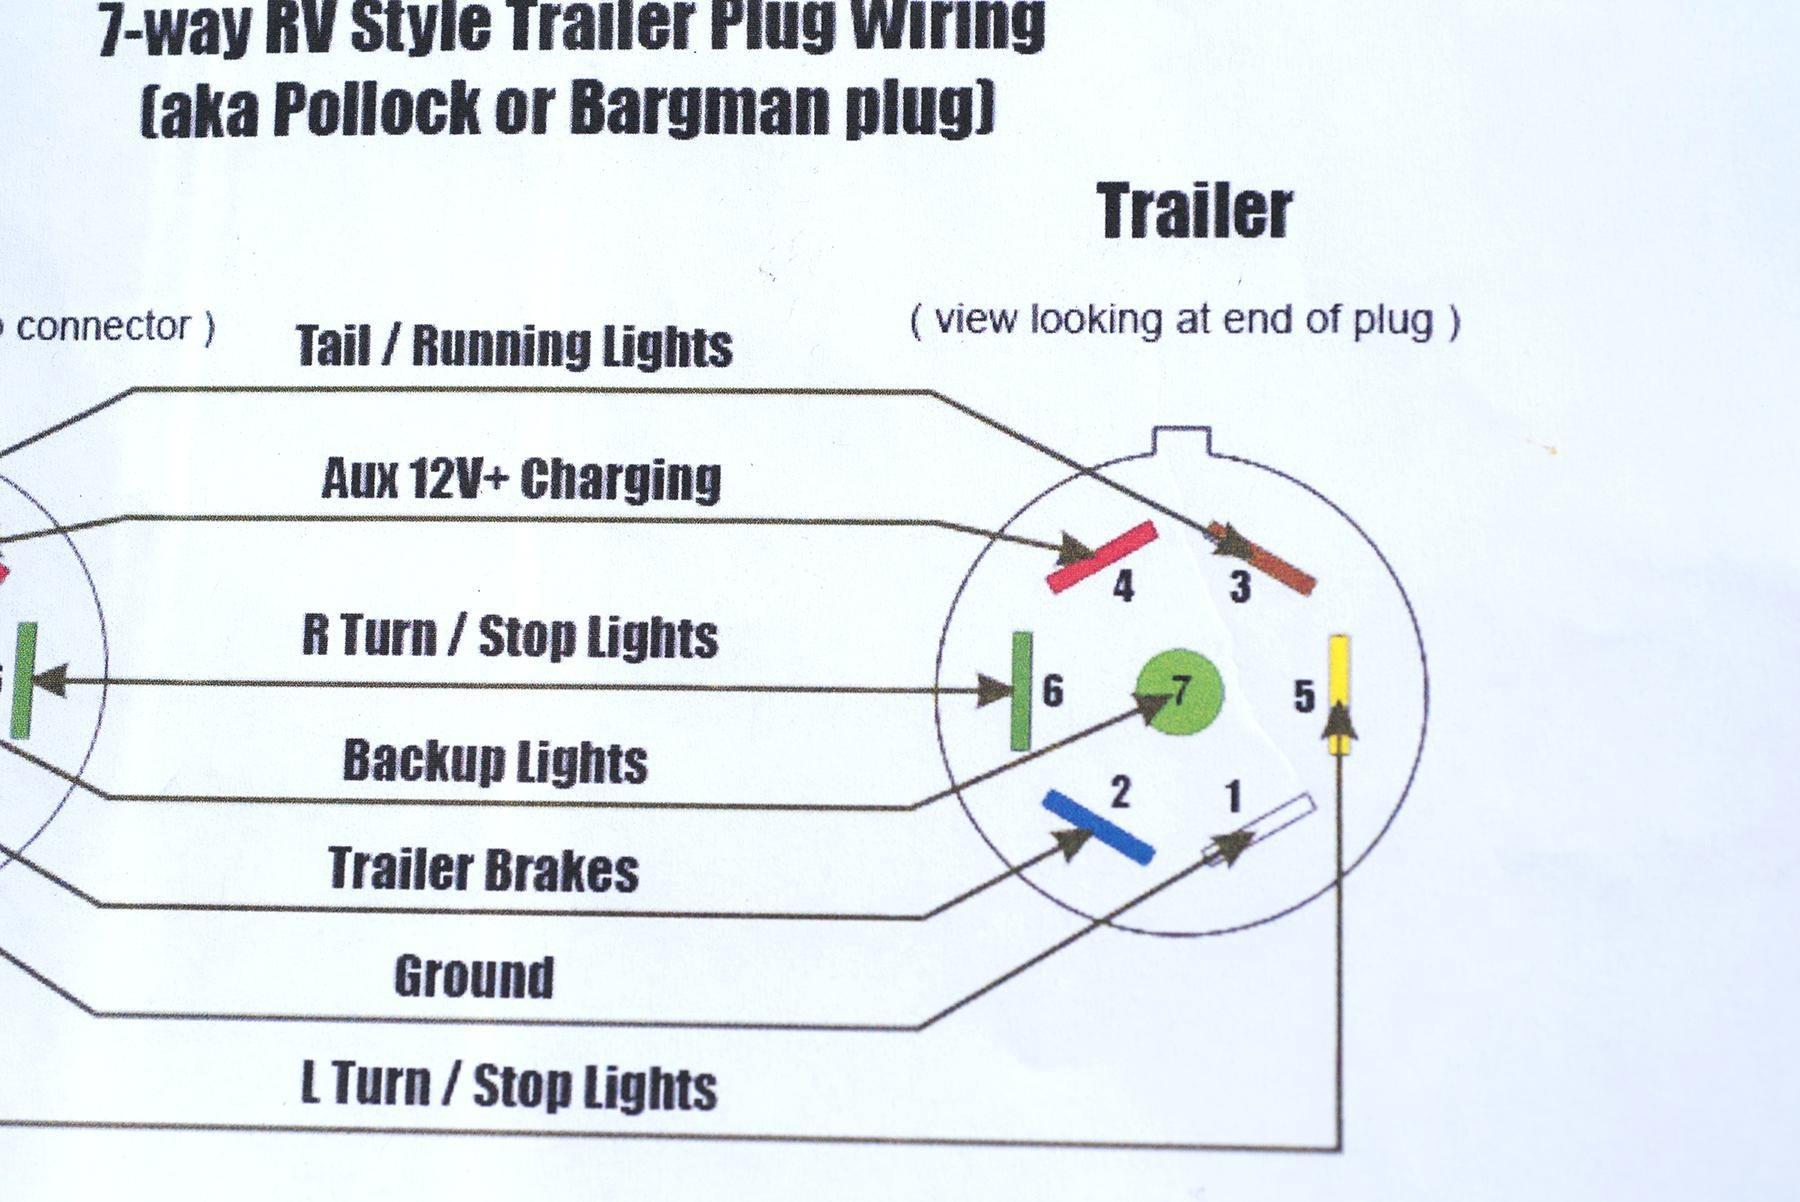 Wiring Diagram Semi Trailer Lights Fresh Semi Trailer Abs Wiring Diagram For 7 Way Plug Tractor Light